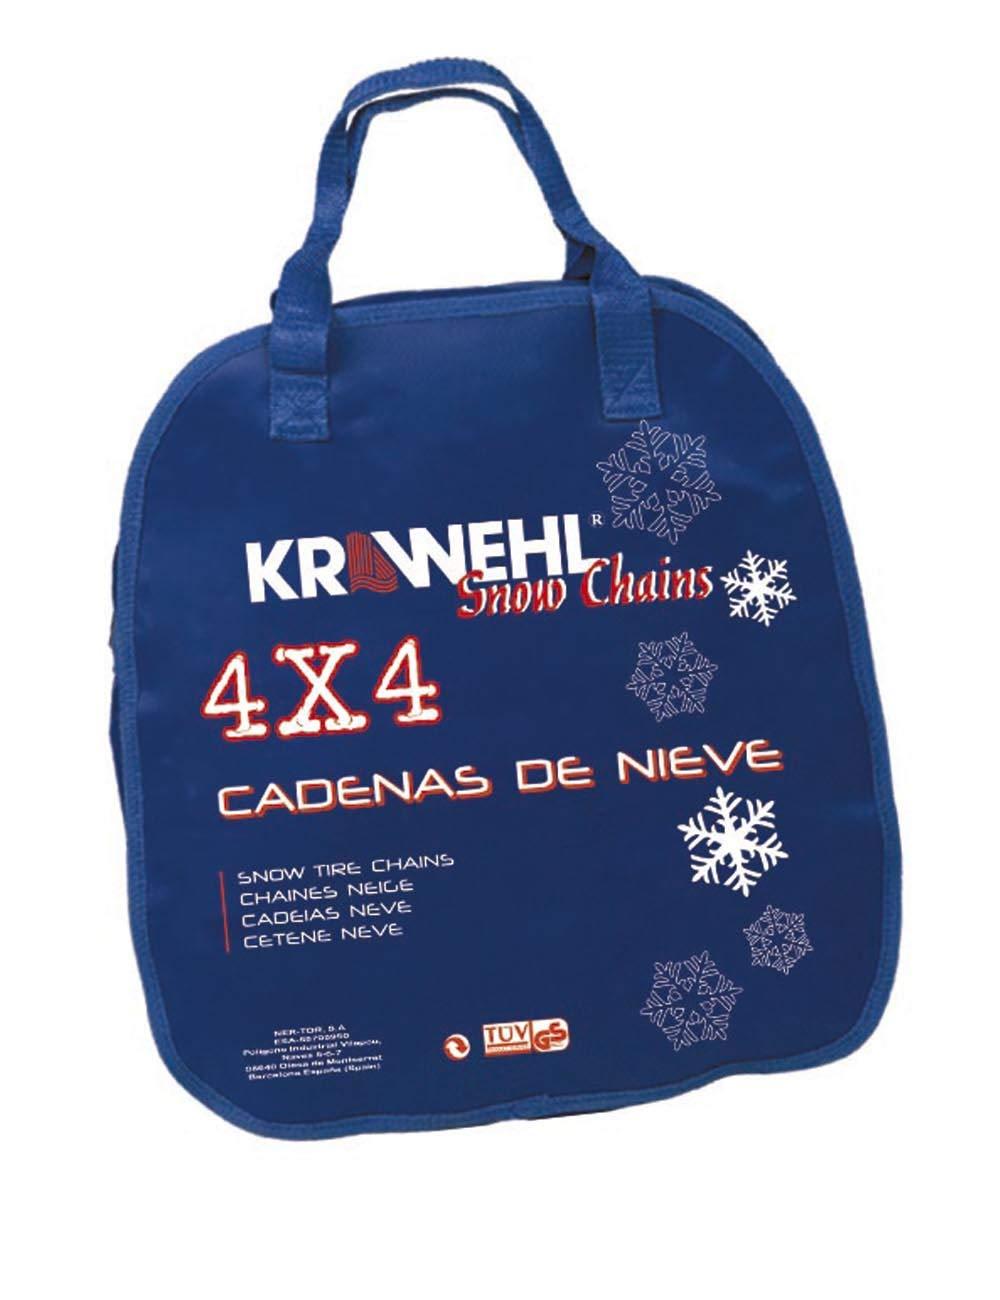 KRAWEHL 3403.0011465/Cadenas de Nieve Grupo 46